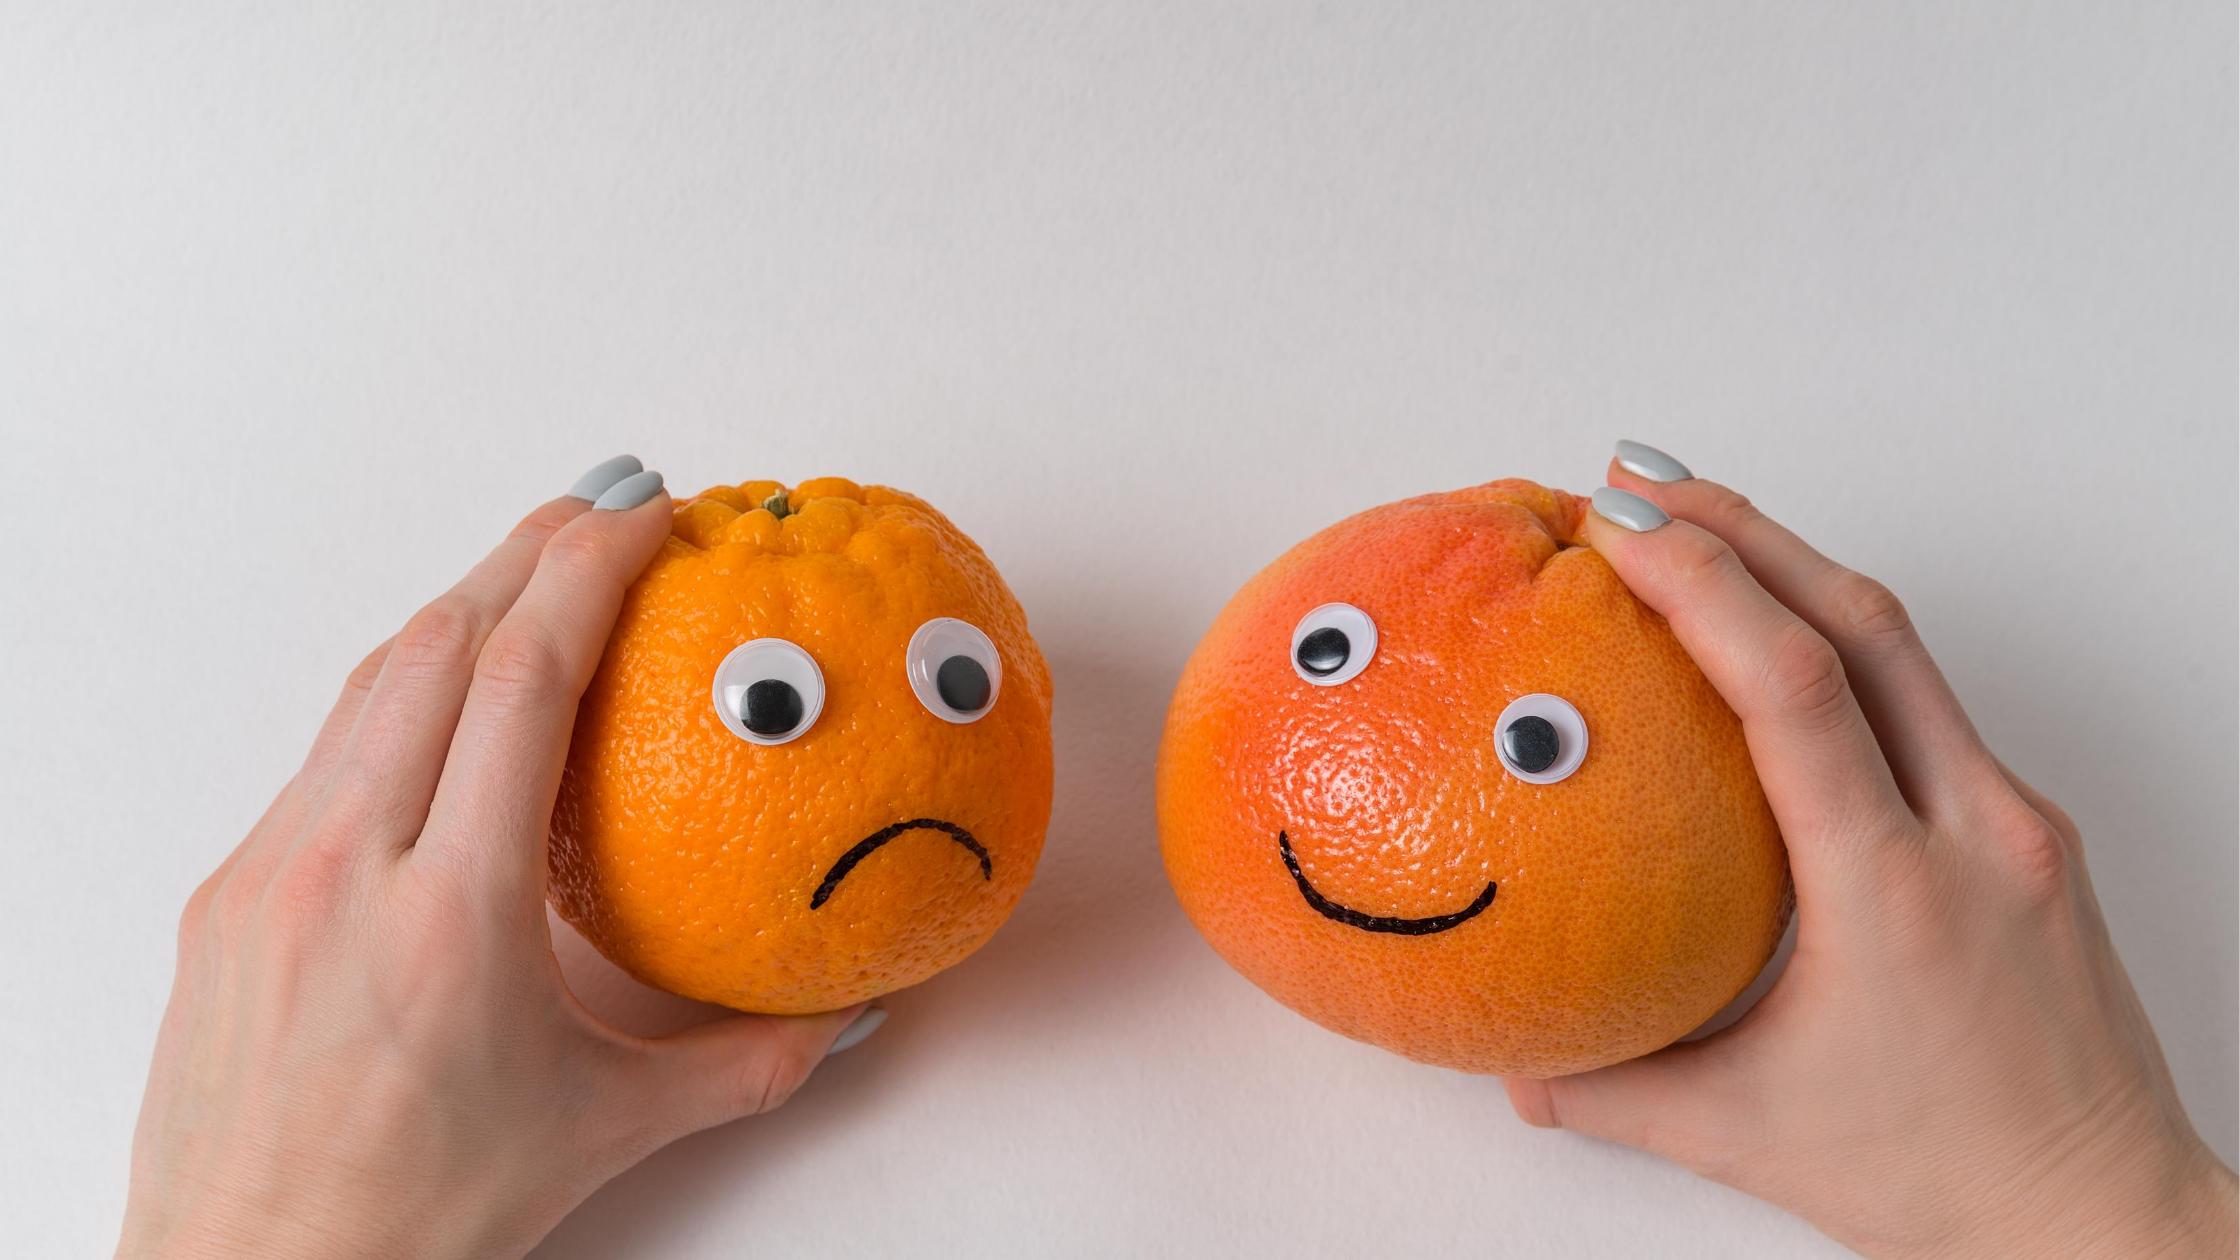 Money mindset: being an optimist or pessimist